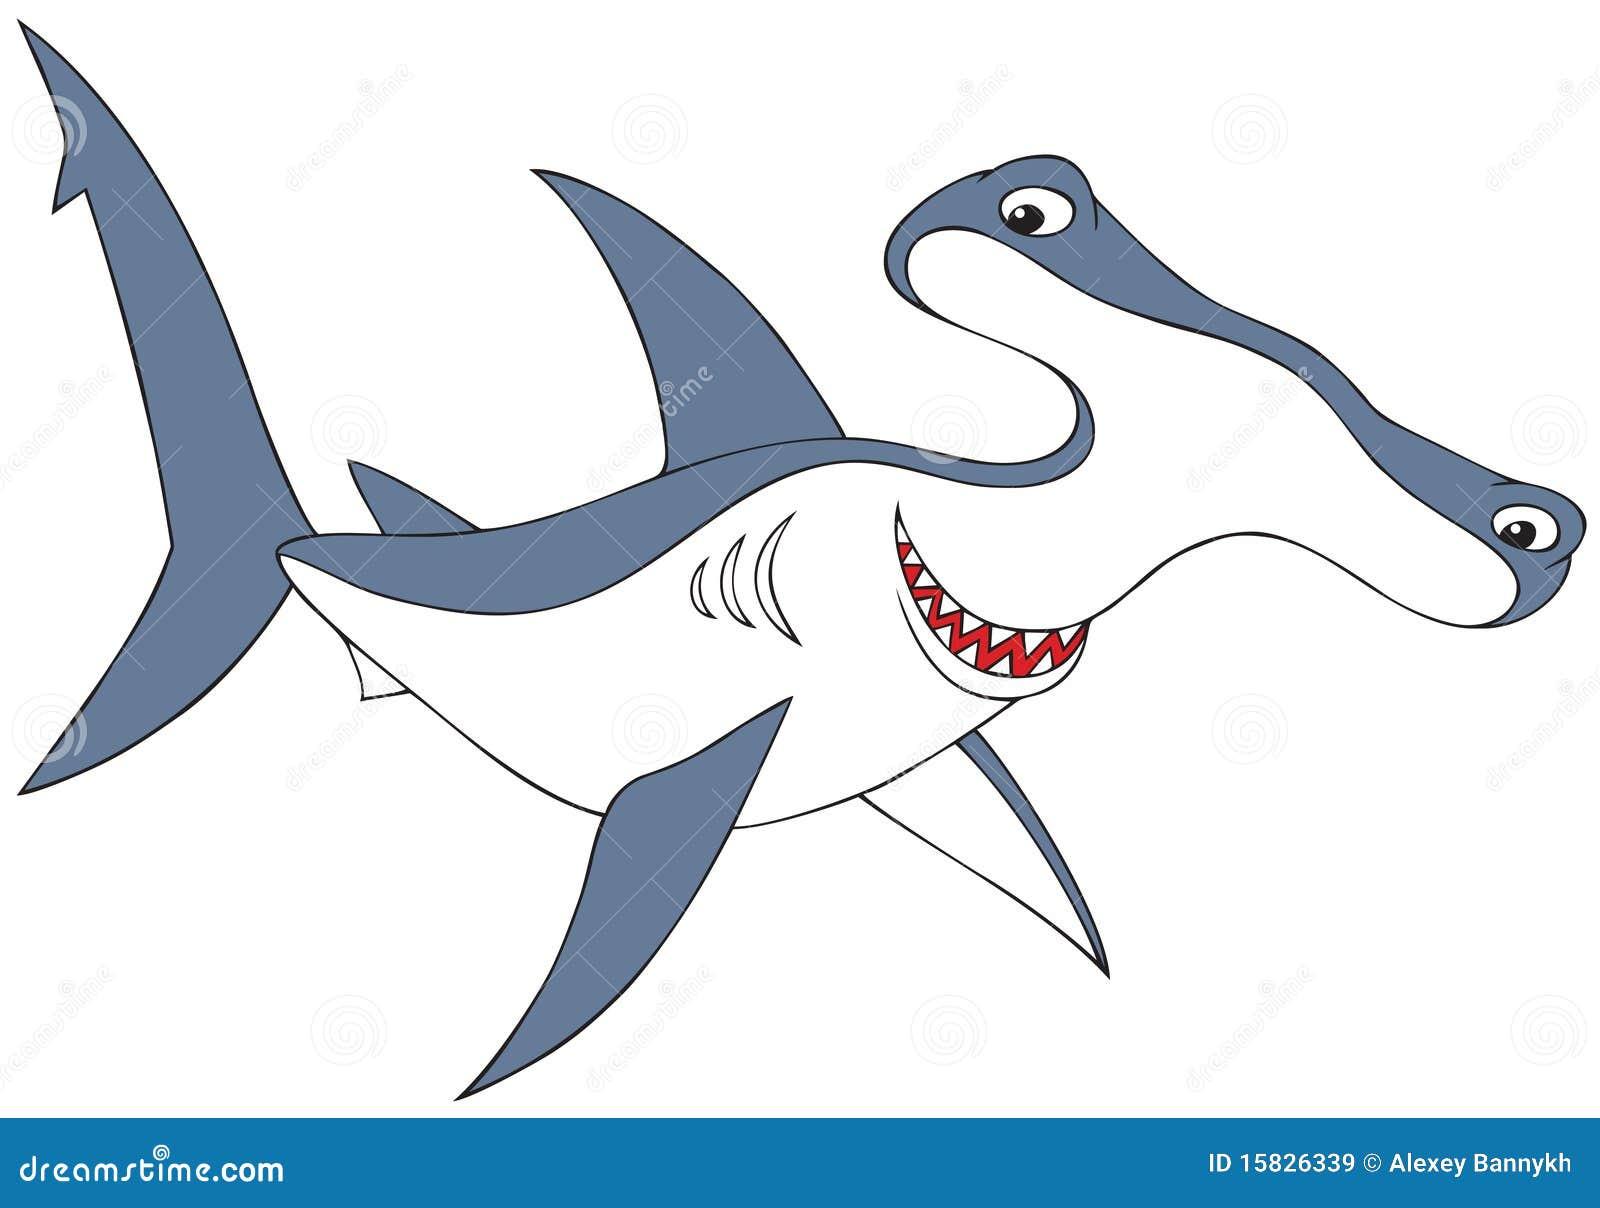 Encantador Tiburones Martillo Para Colorear Foto - Ideas Para ...